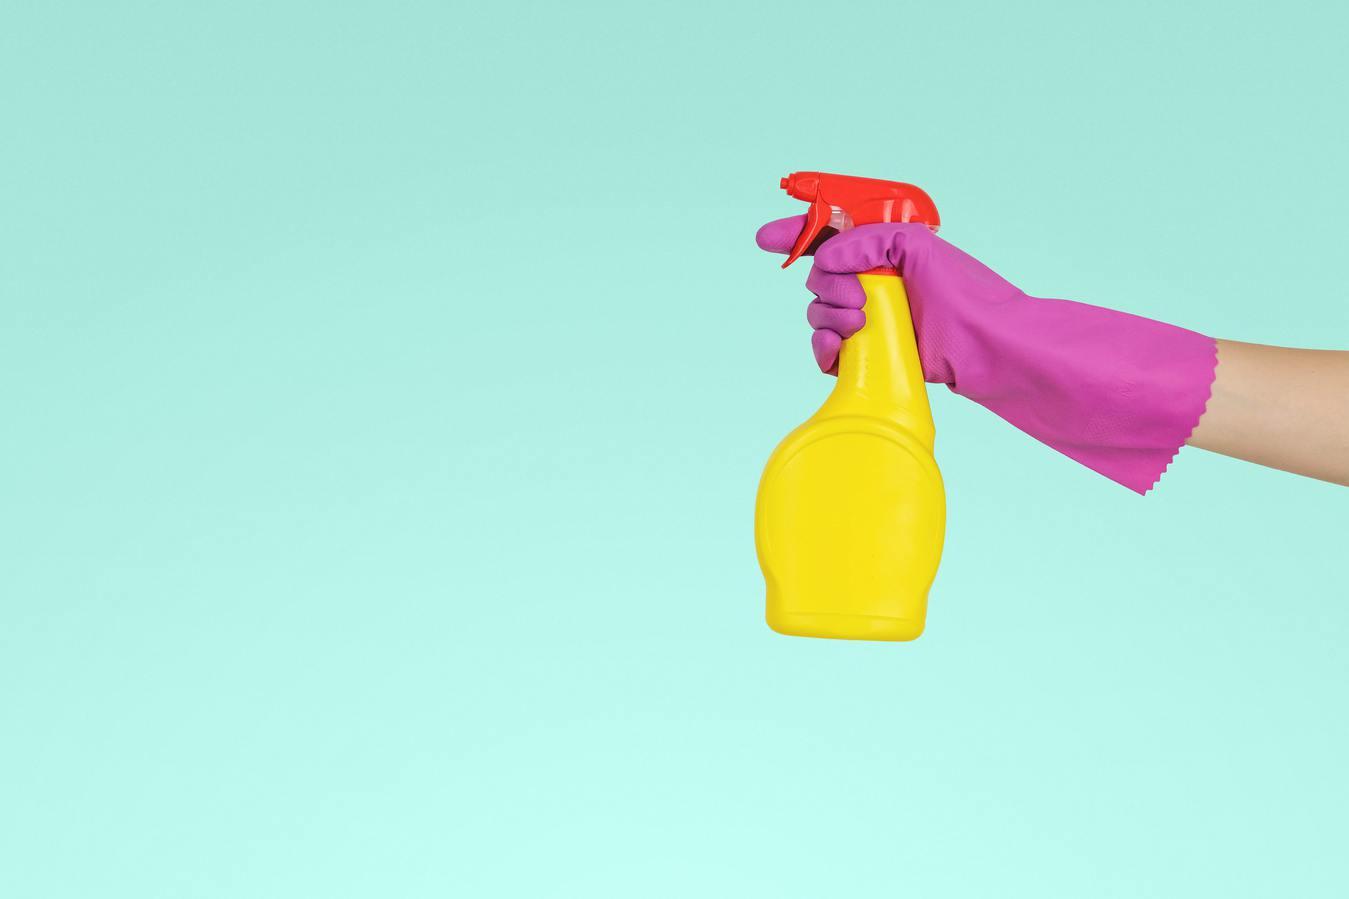 Una persona sosteniendo una botella de spray amarilla con fondo azul